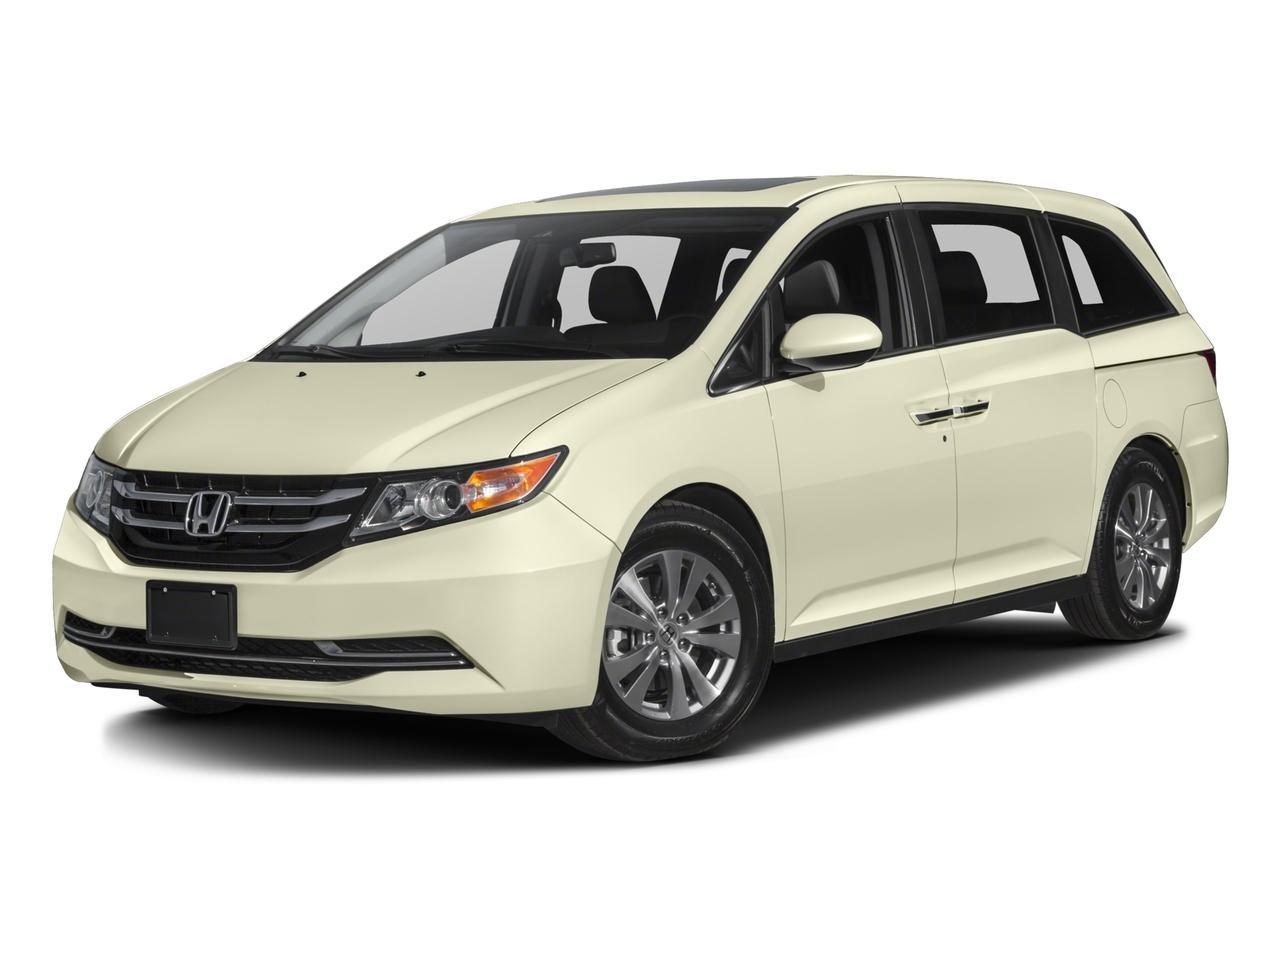 2016 Honda Odyssey Vehicle Photo in Peoria, IL 61615